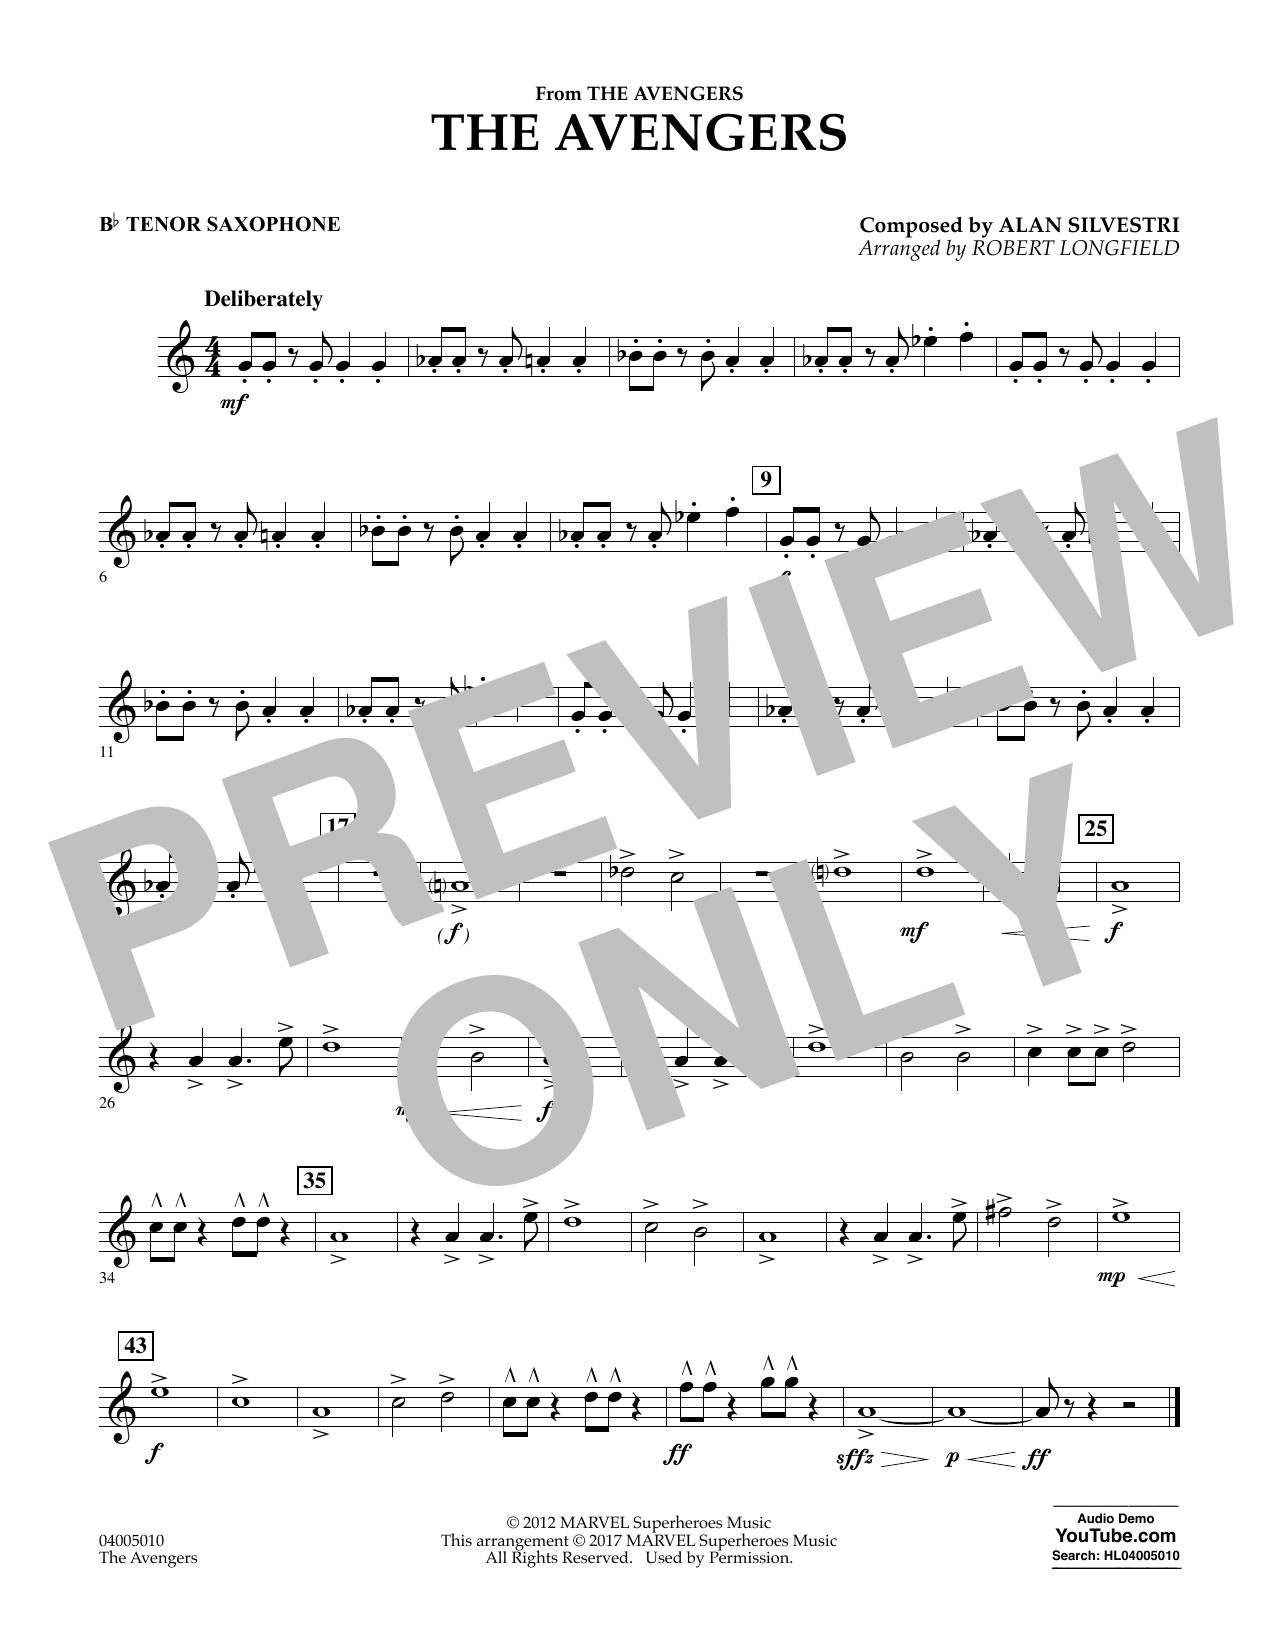 Alan Silvestri - The Avengers - Bb Tenor Saxophone